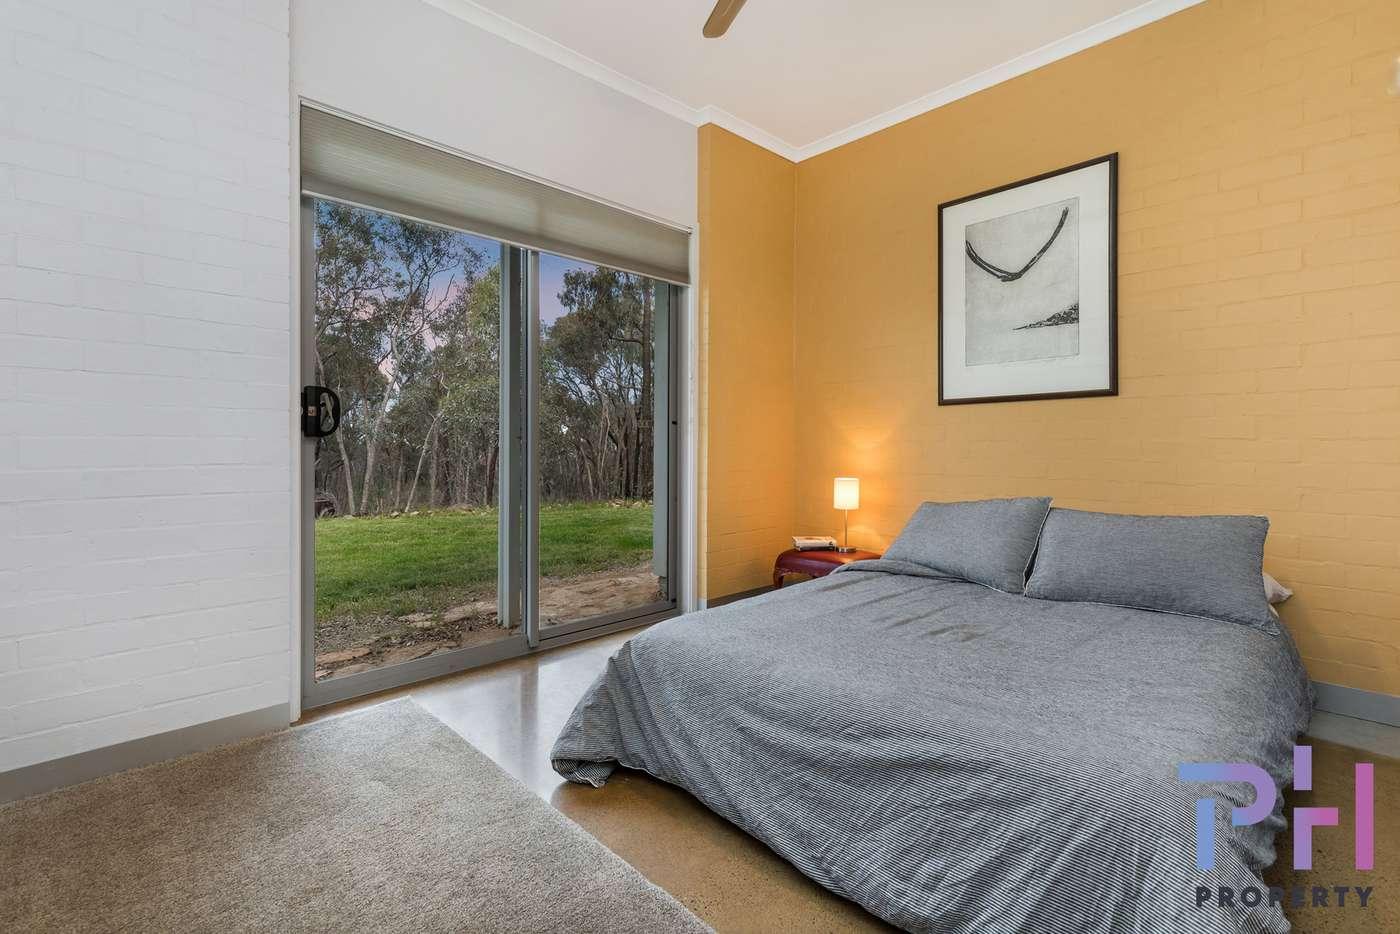 Sixth view of Homely house listing, 50 Fadersons Lane, Mandurang VIC 3551